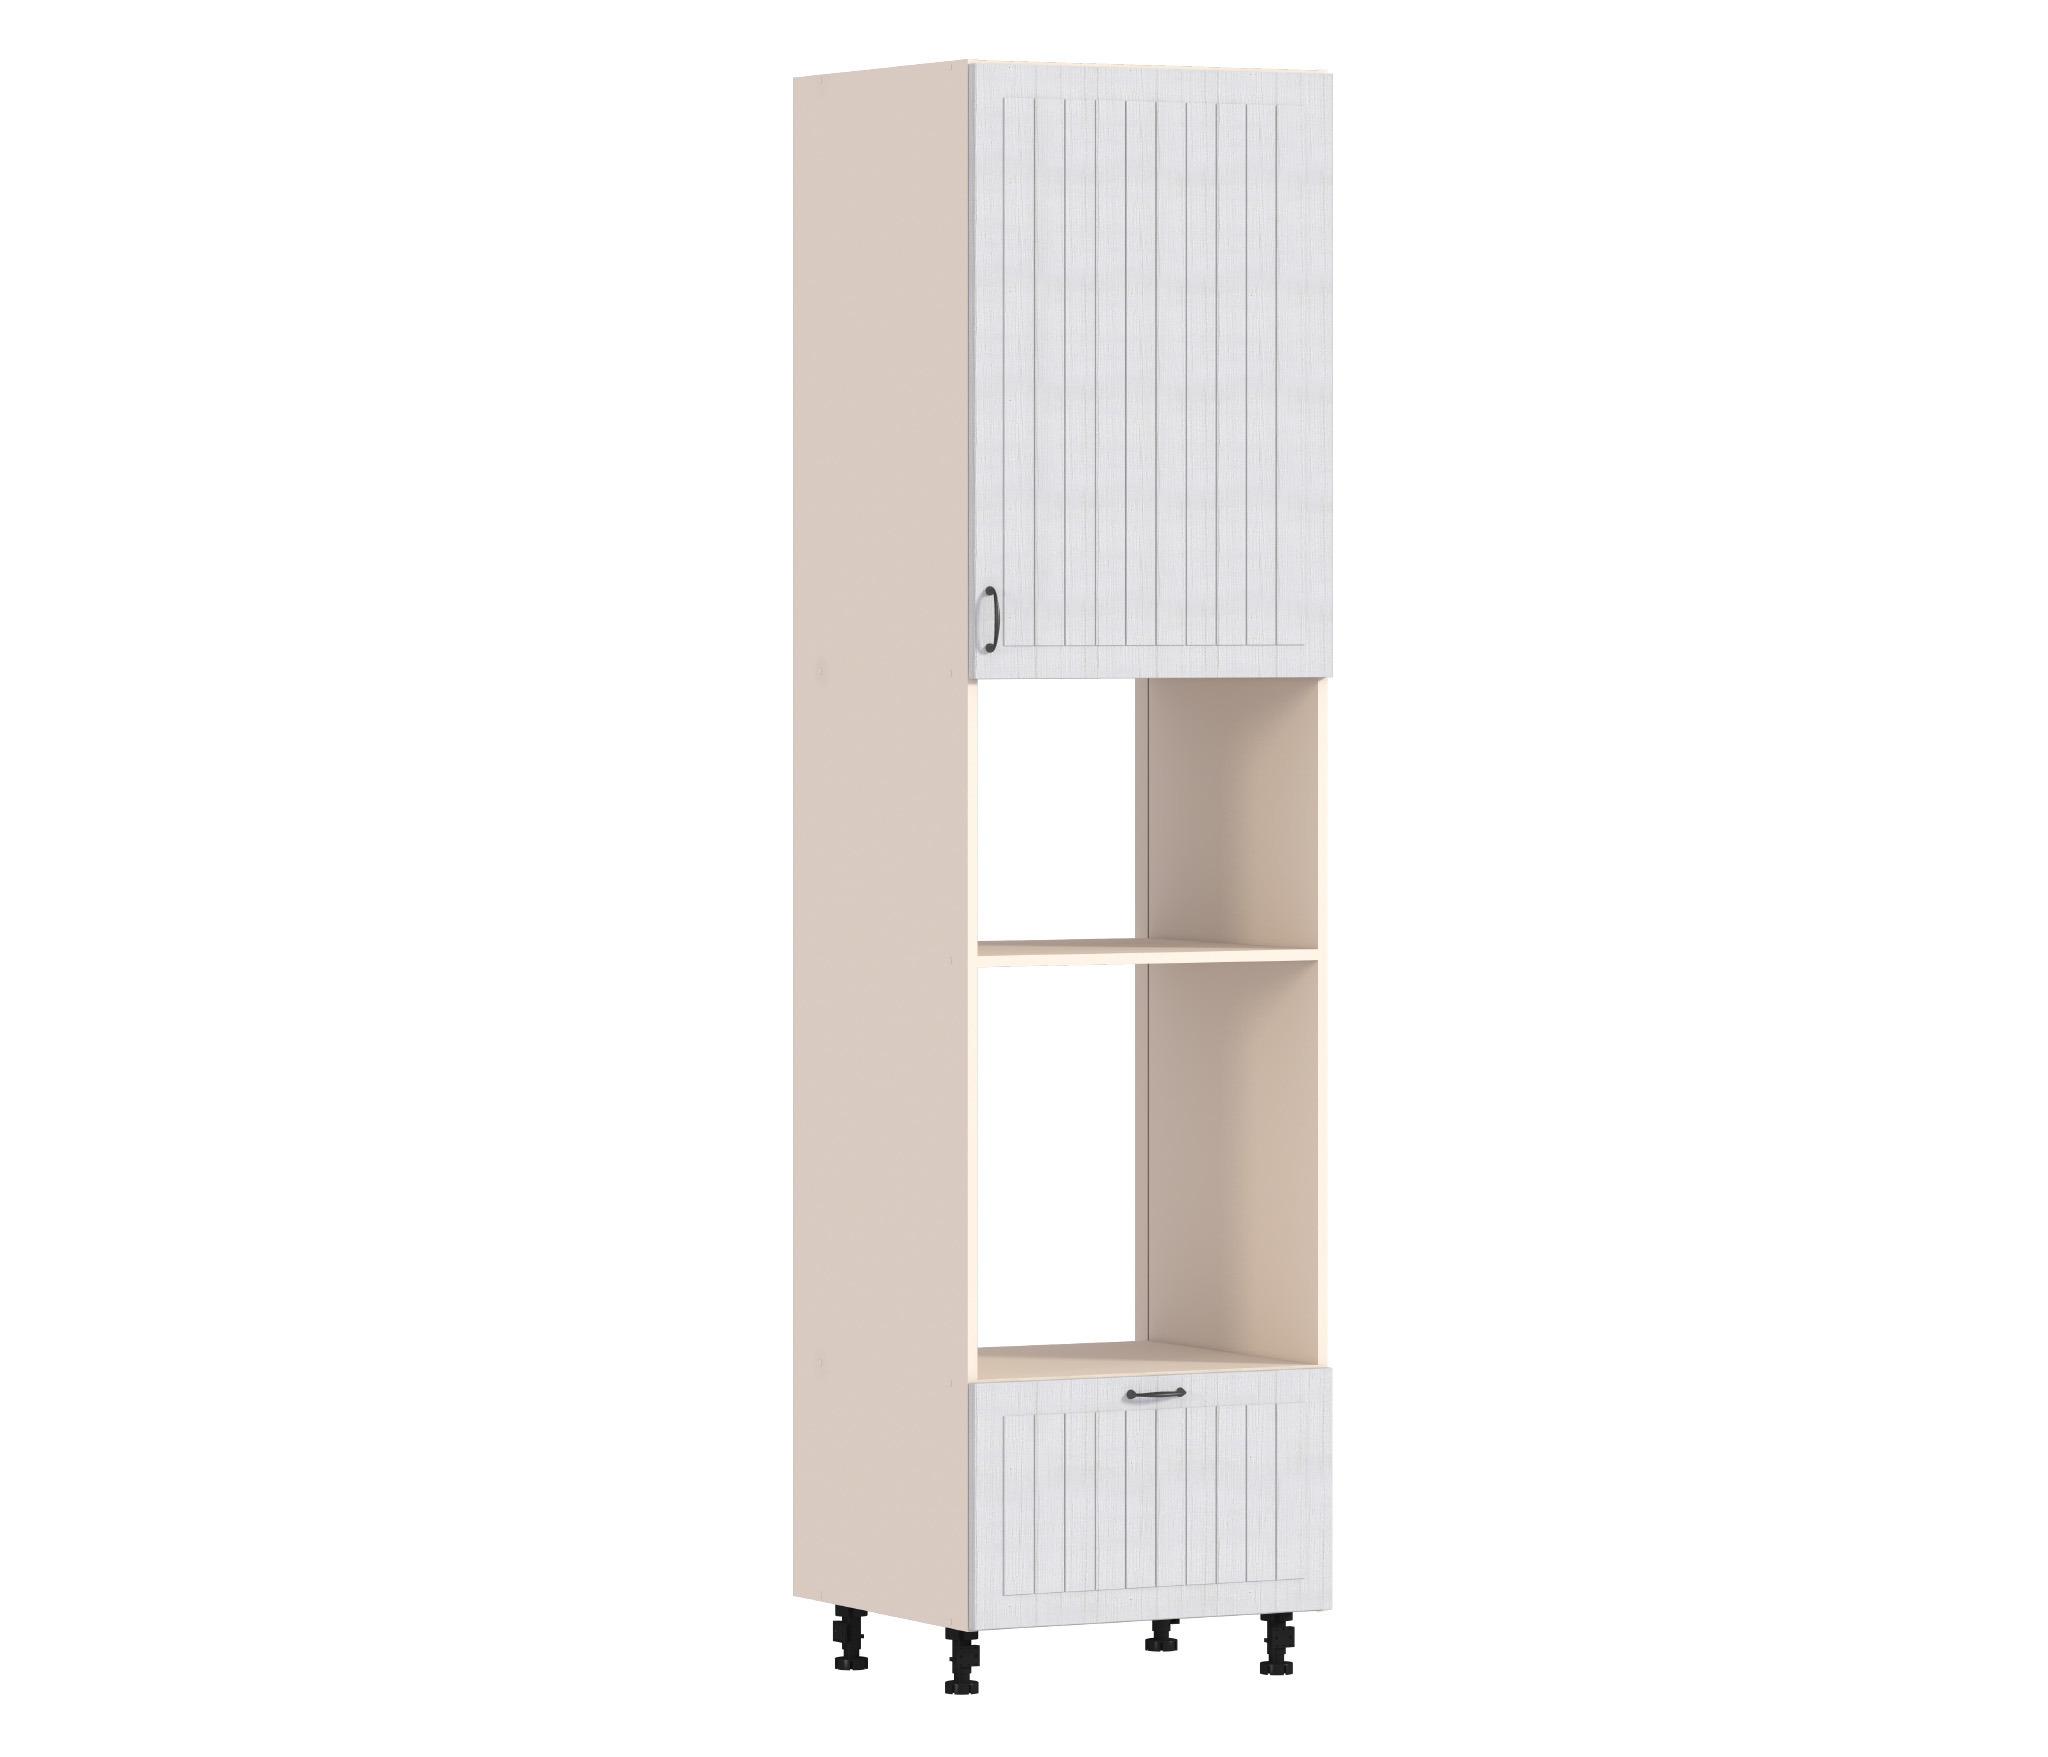 Регина РП-660 пеналМебель для кухни<br><br><br>Длина мм: 0<br>Высота мм: 0<br>Глубина мм: 0